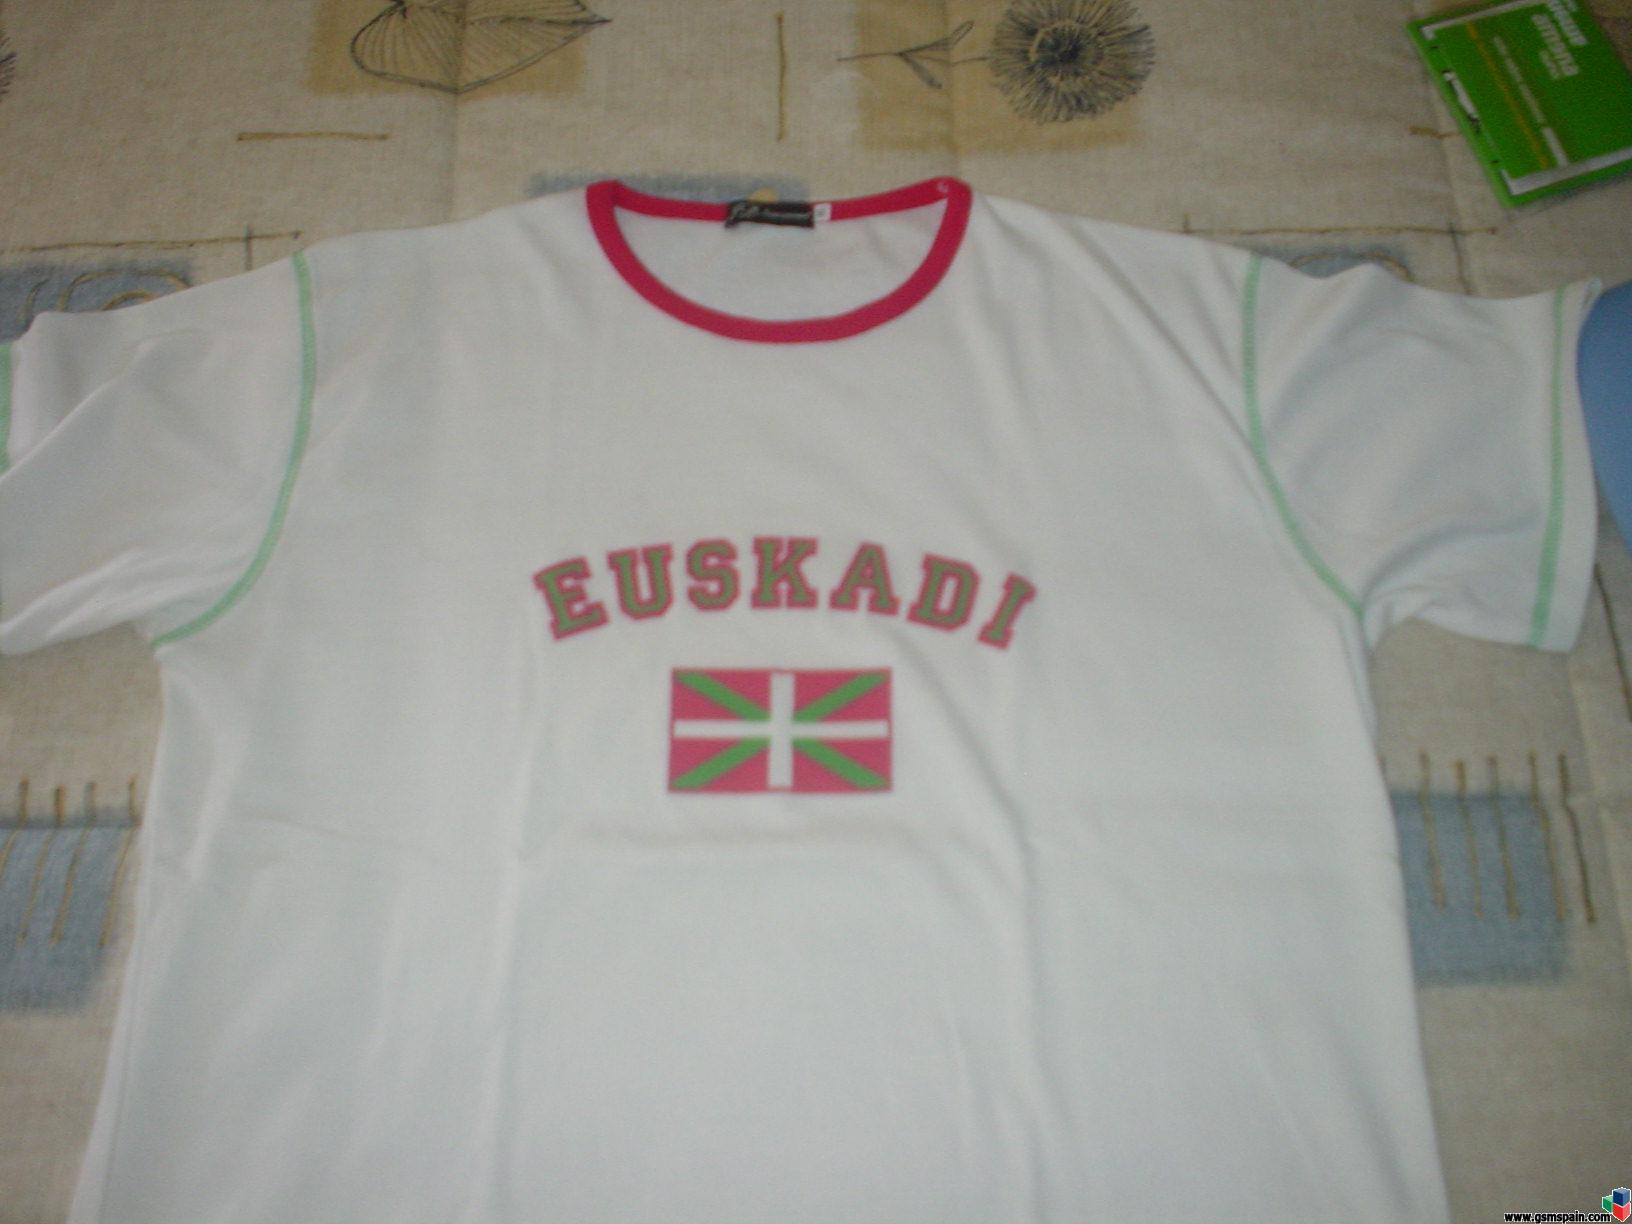 Recargas de Euskaltel en Canarias